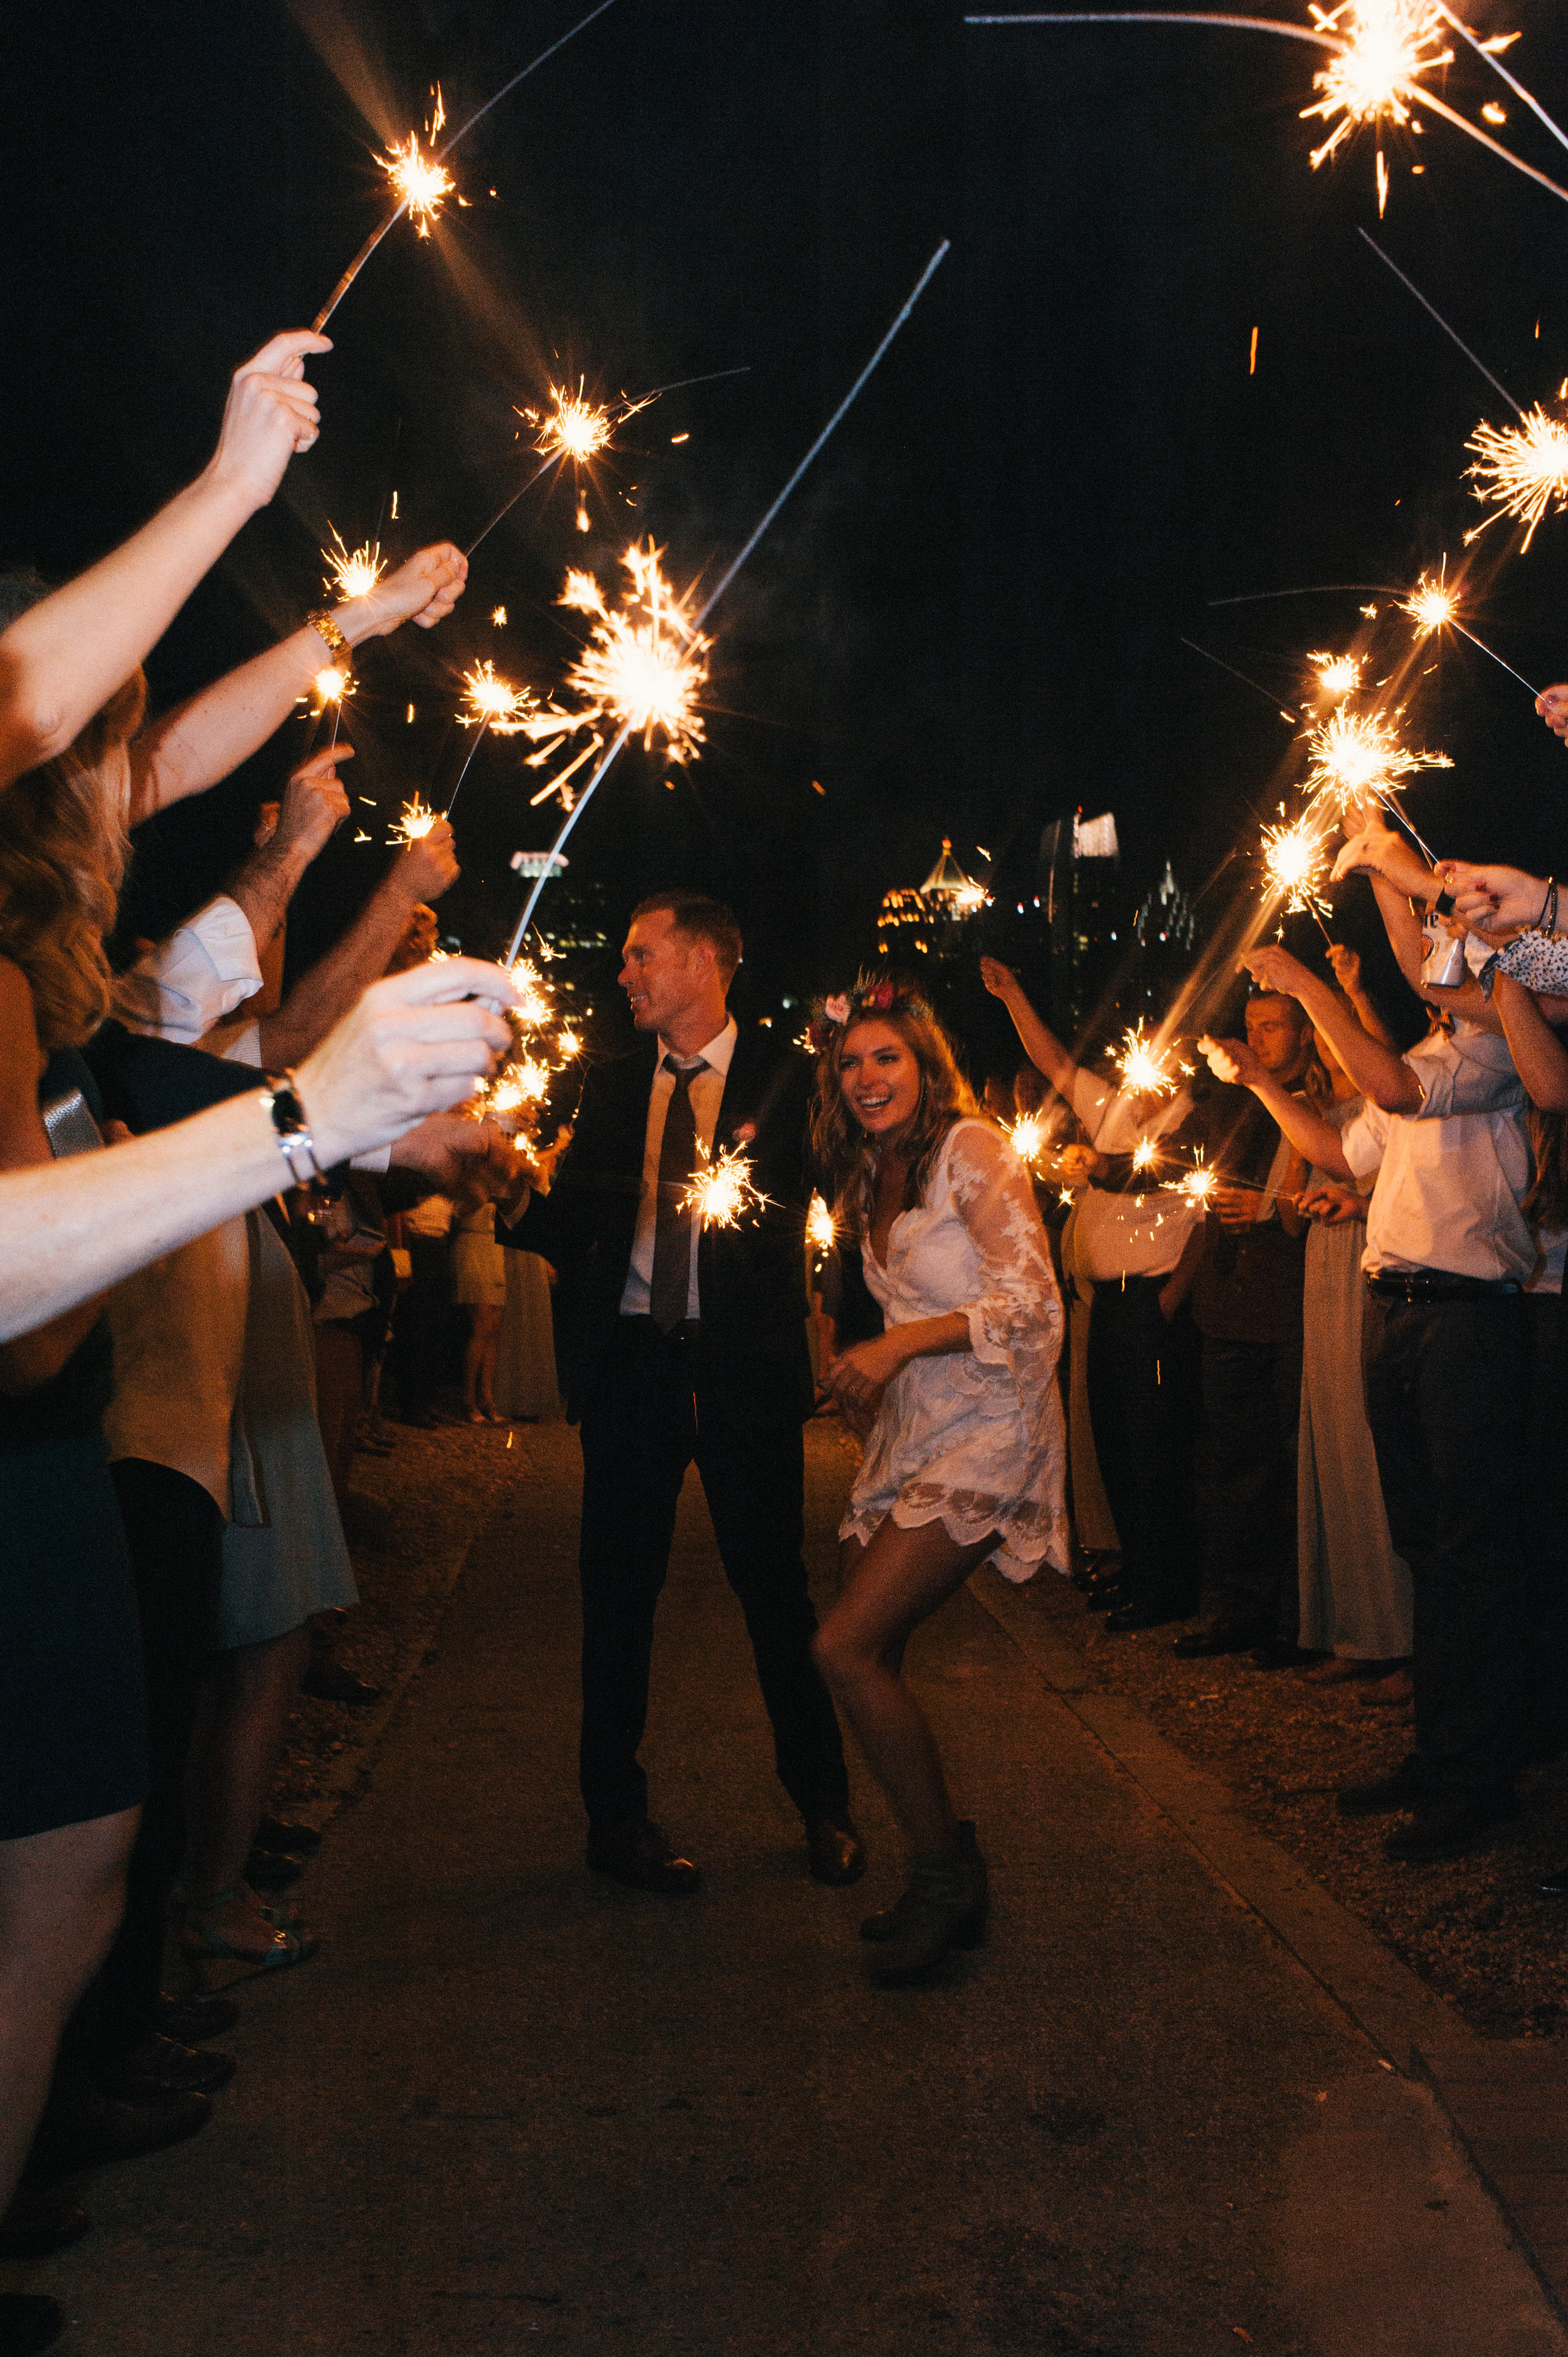 kristin-and-peter-atlanta-georgia-wedding-october-8th-2016 (1066 of 1068).jpg